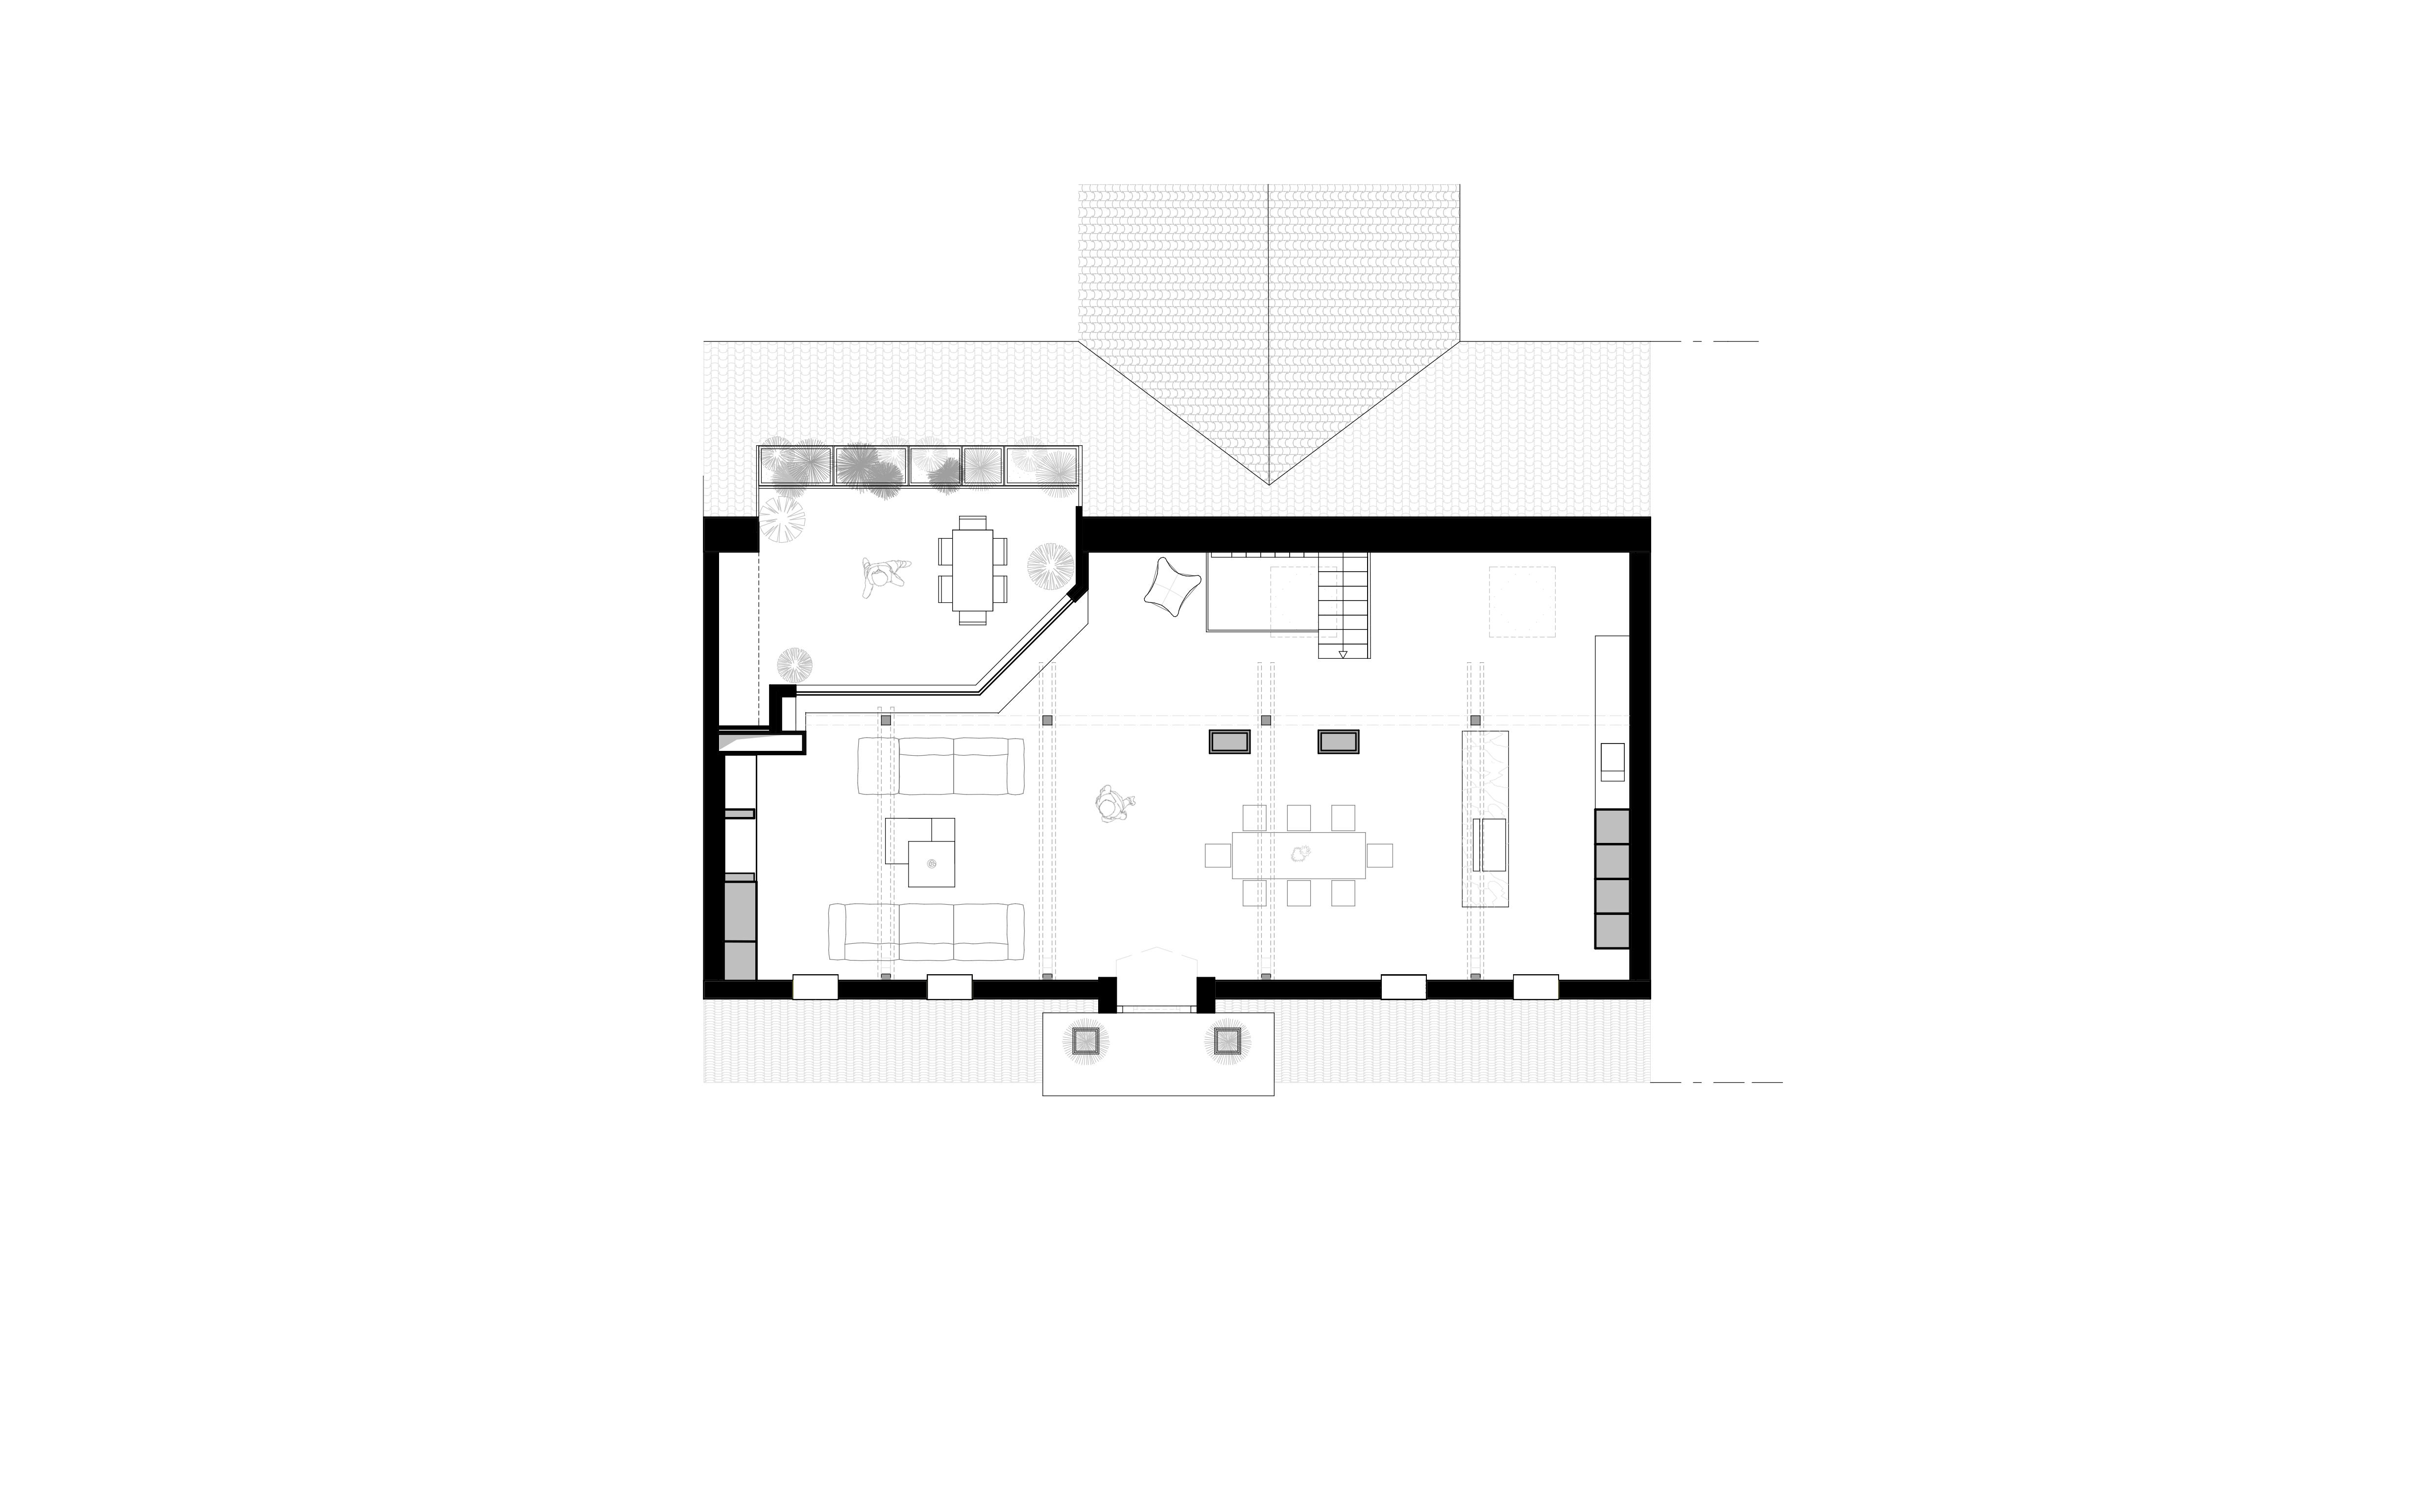 BRDX-FF-02-Plan-upper-floor